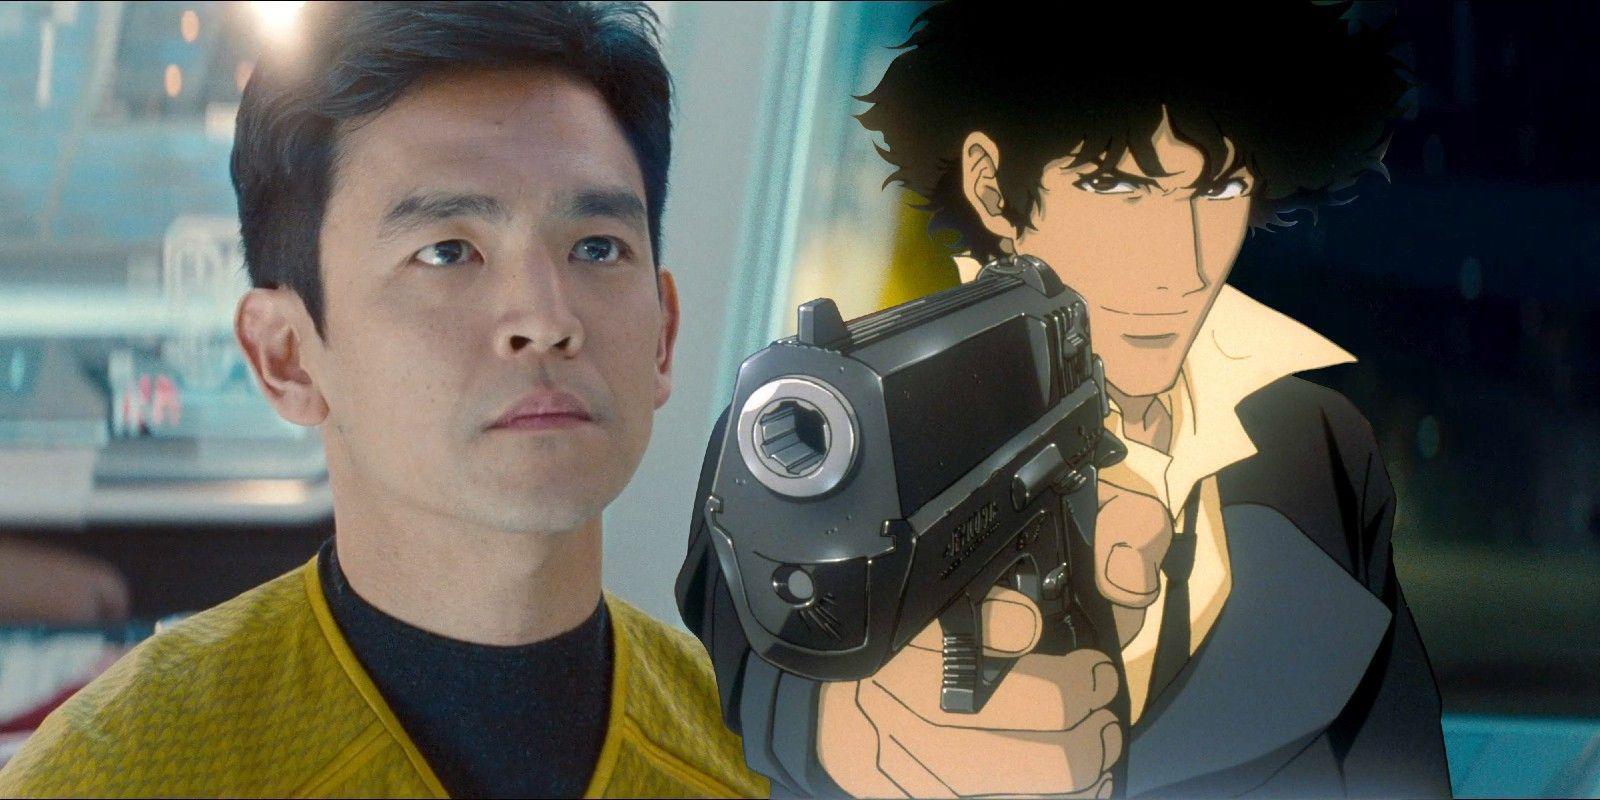 Netflix's Live-Action Cowboy Bebop TV Show Casts John Cho & More